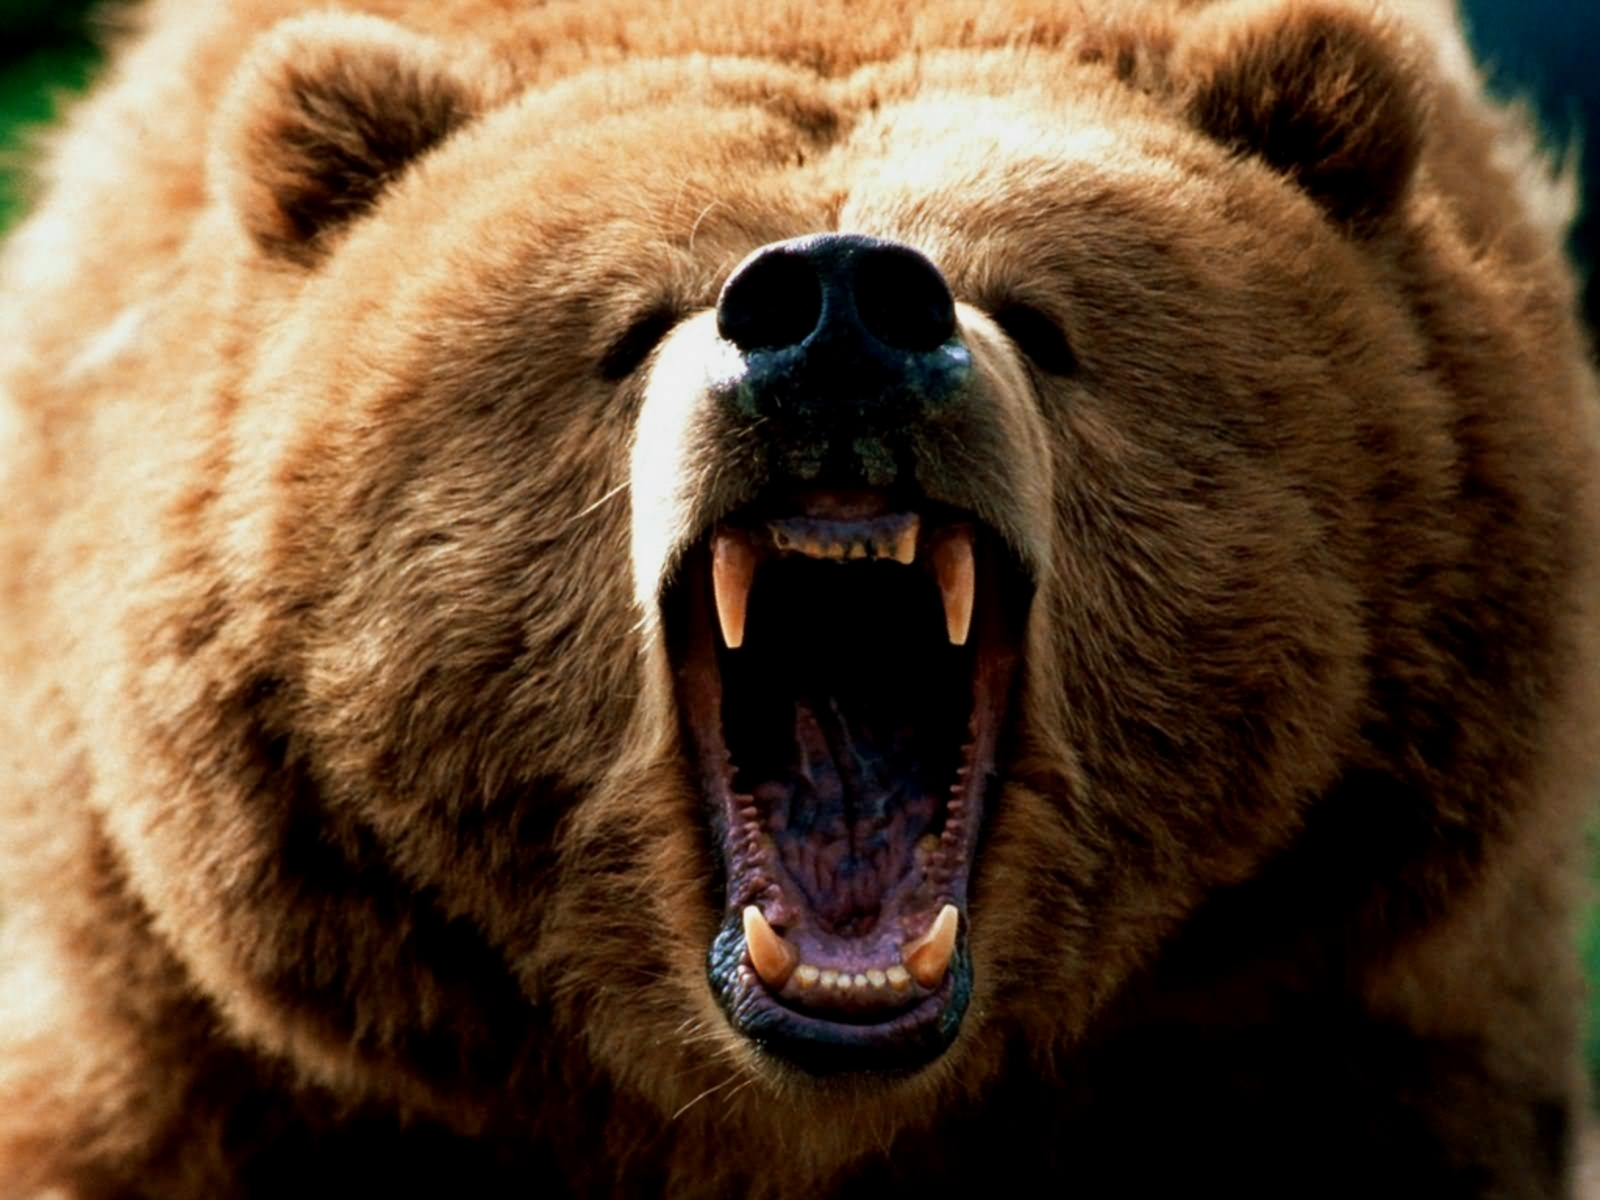 bear wallpaper,brown bear,mammal,vertebrate,terrestrial animal,grizzly bear